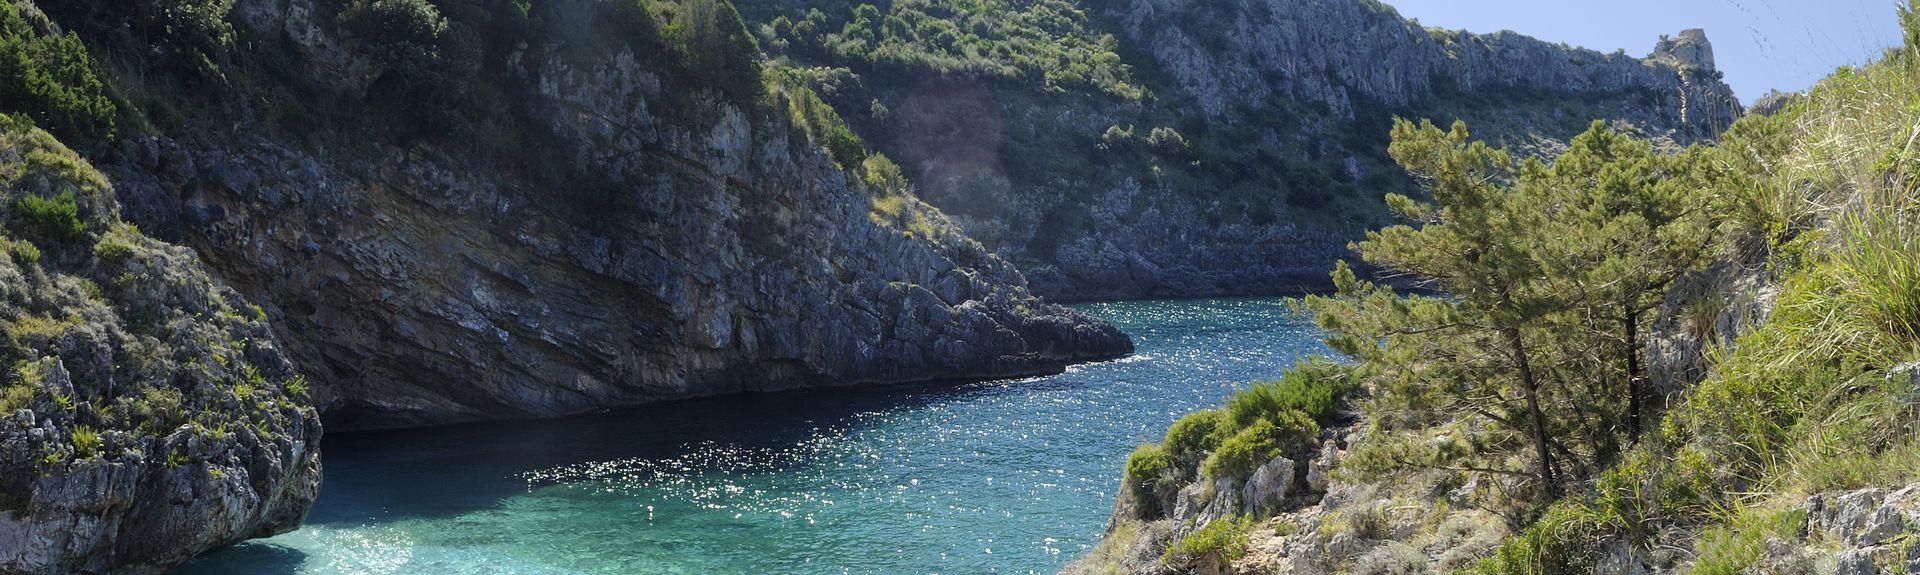 Pisciotta, Salerno, Campania, Italy